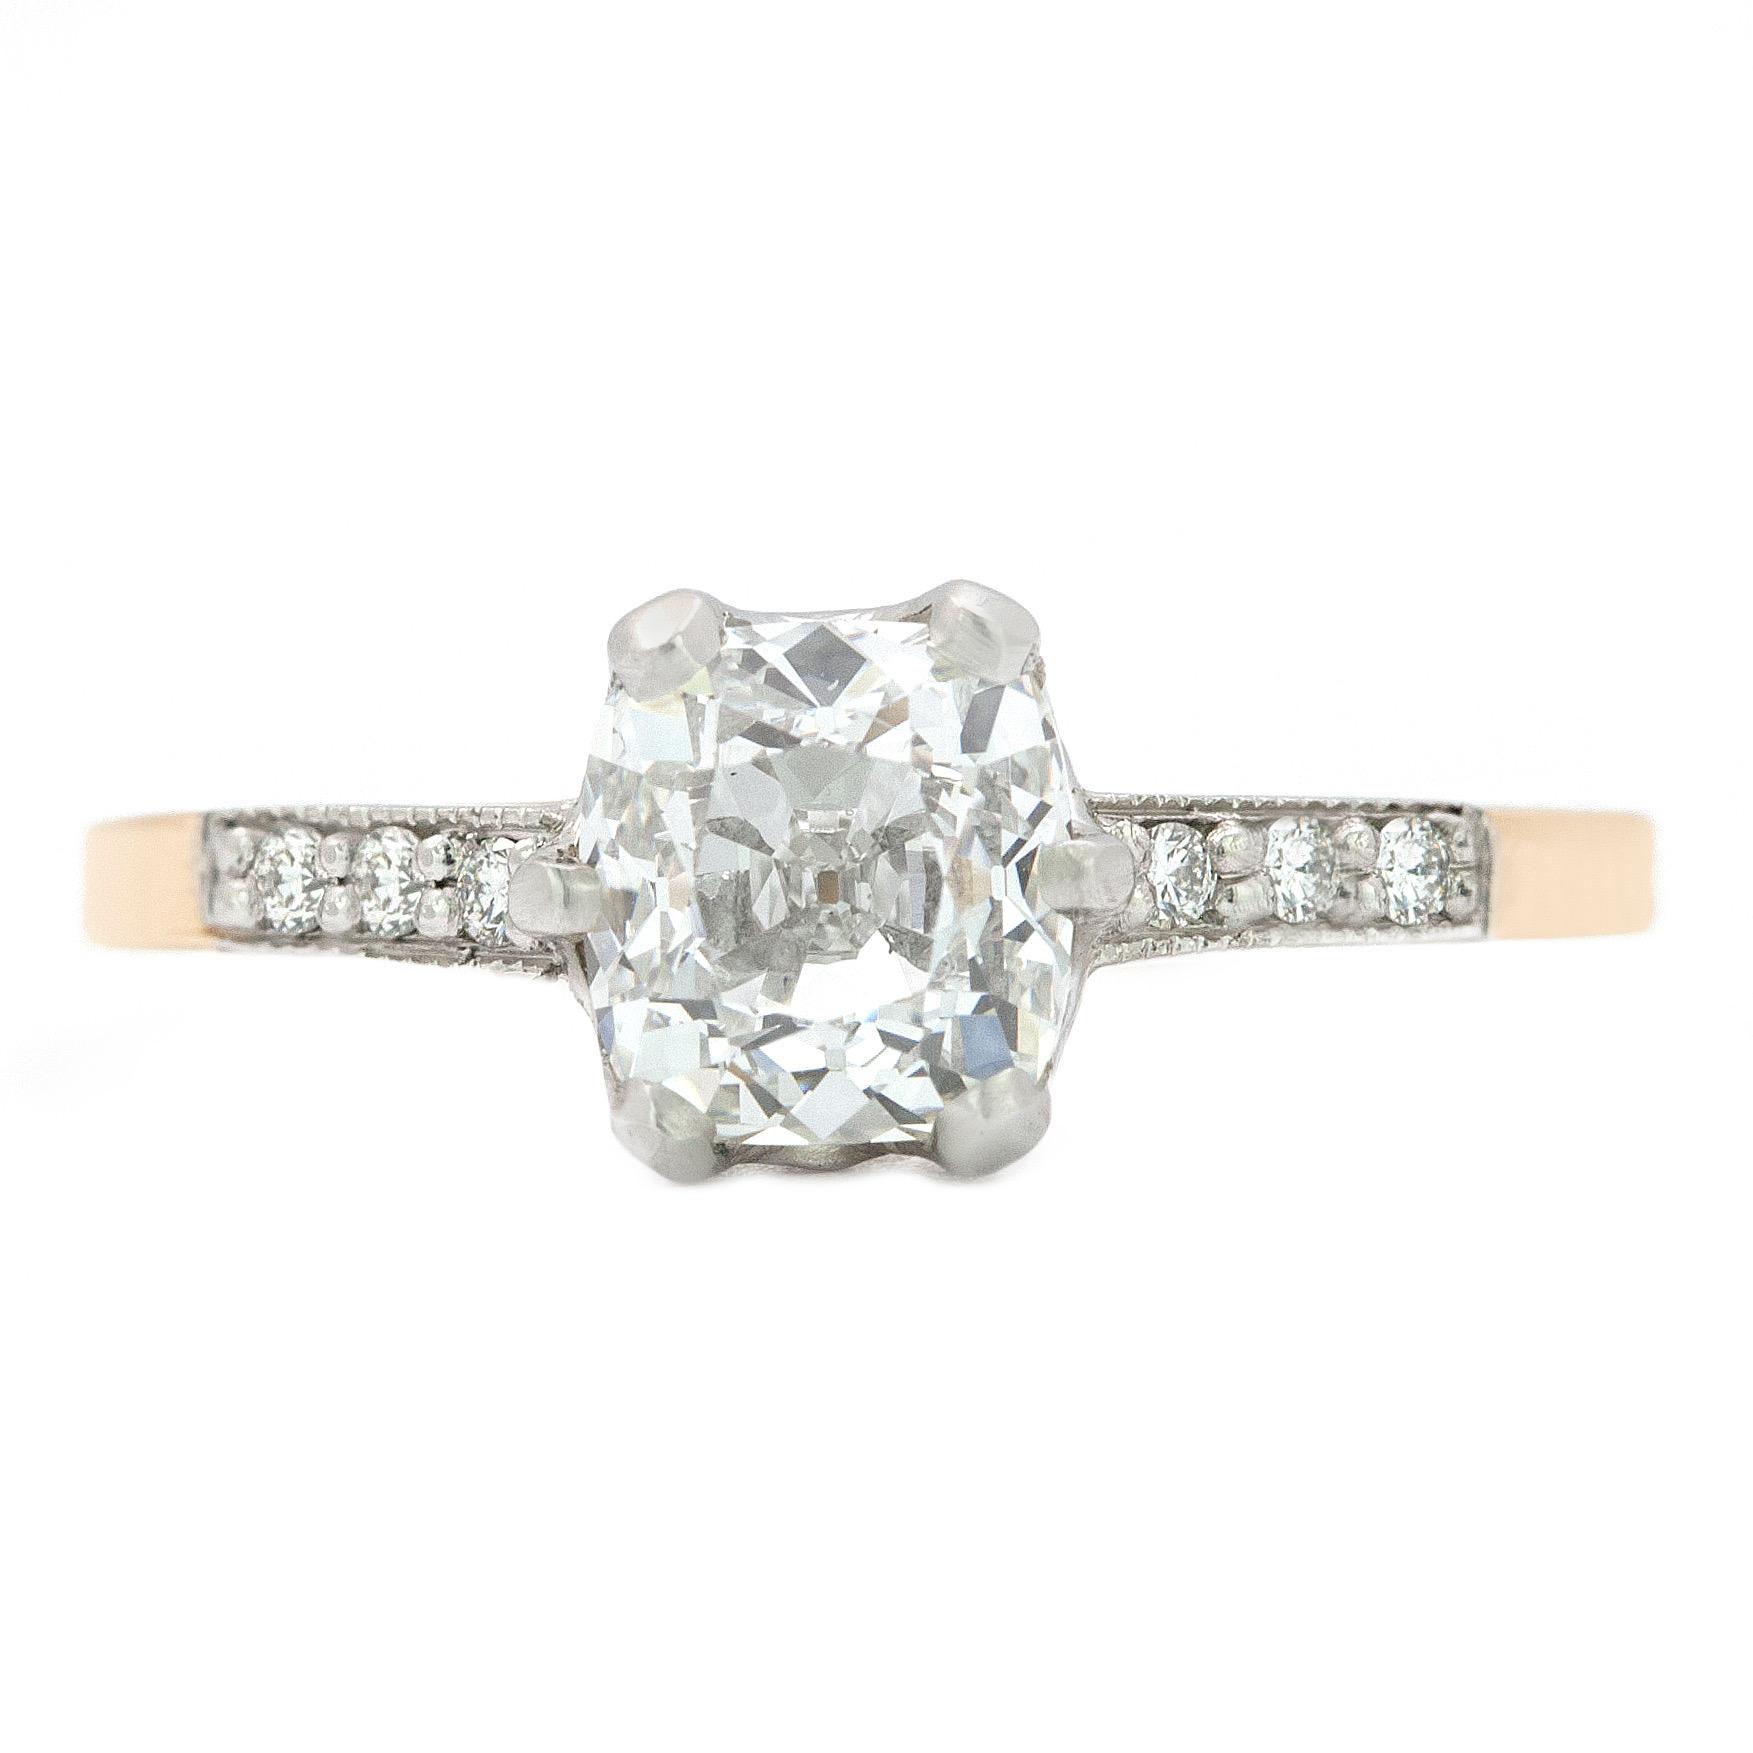 Leeser Diamonds – Jewelry Gallery – 5